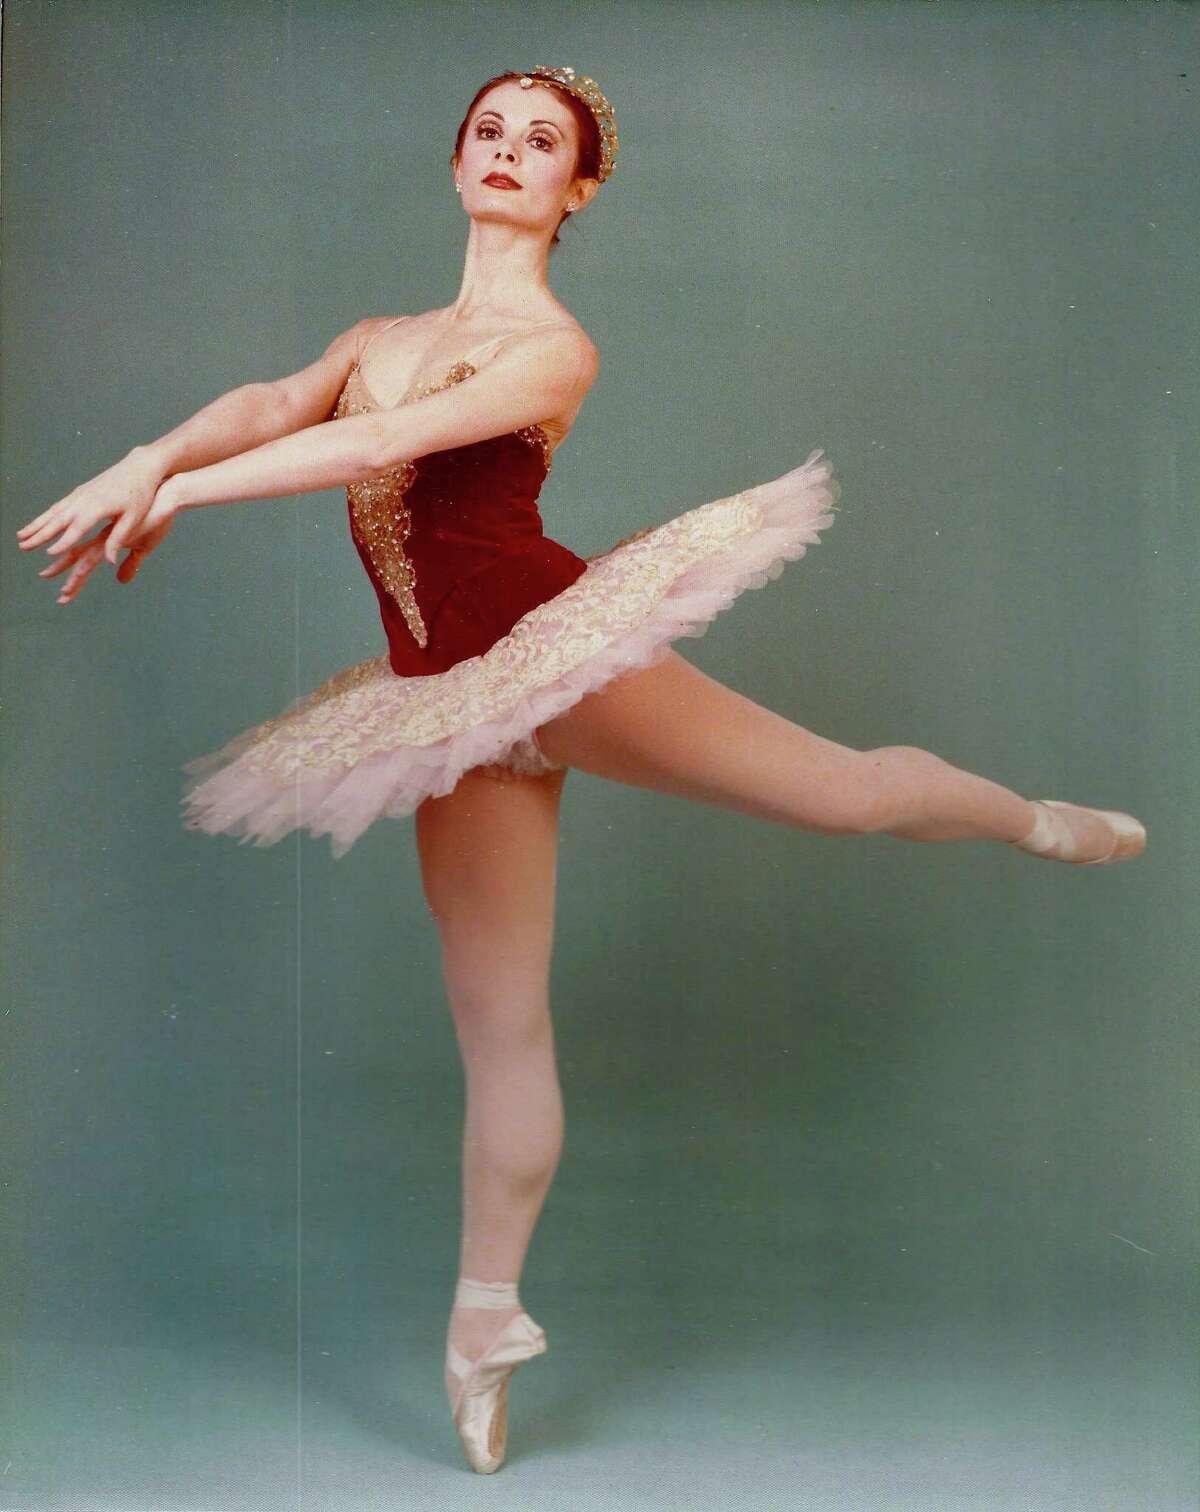 Denise Warner Limoli, Nutmeg's first ballerina, strikes a pose.